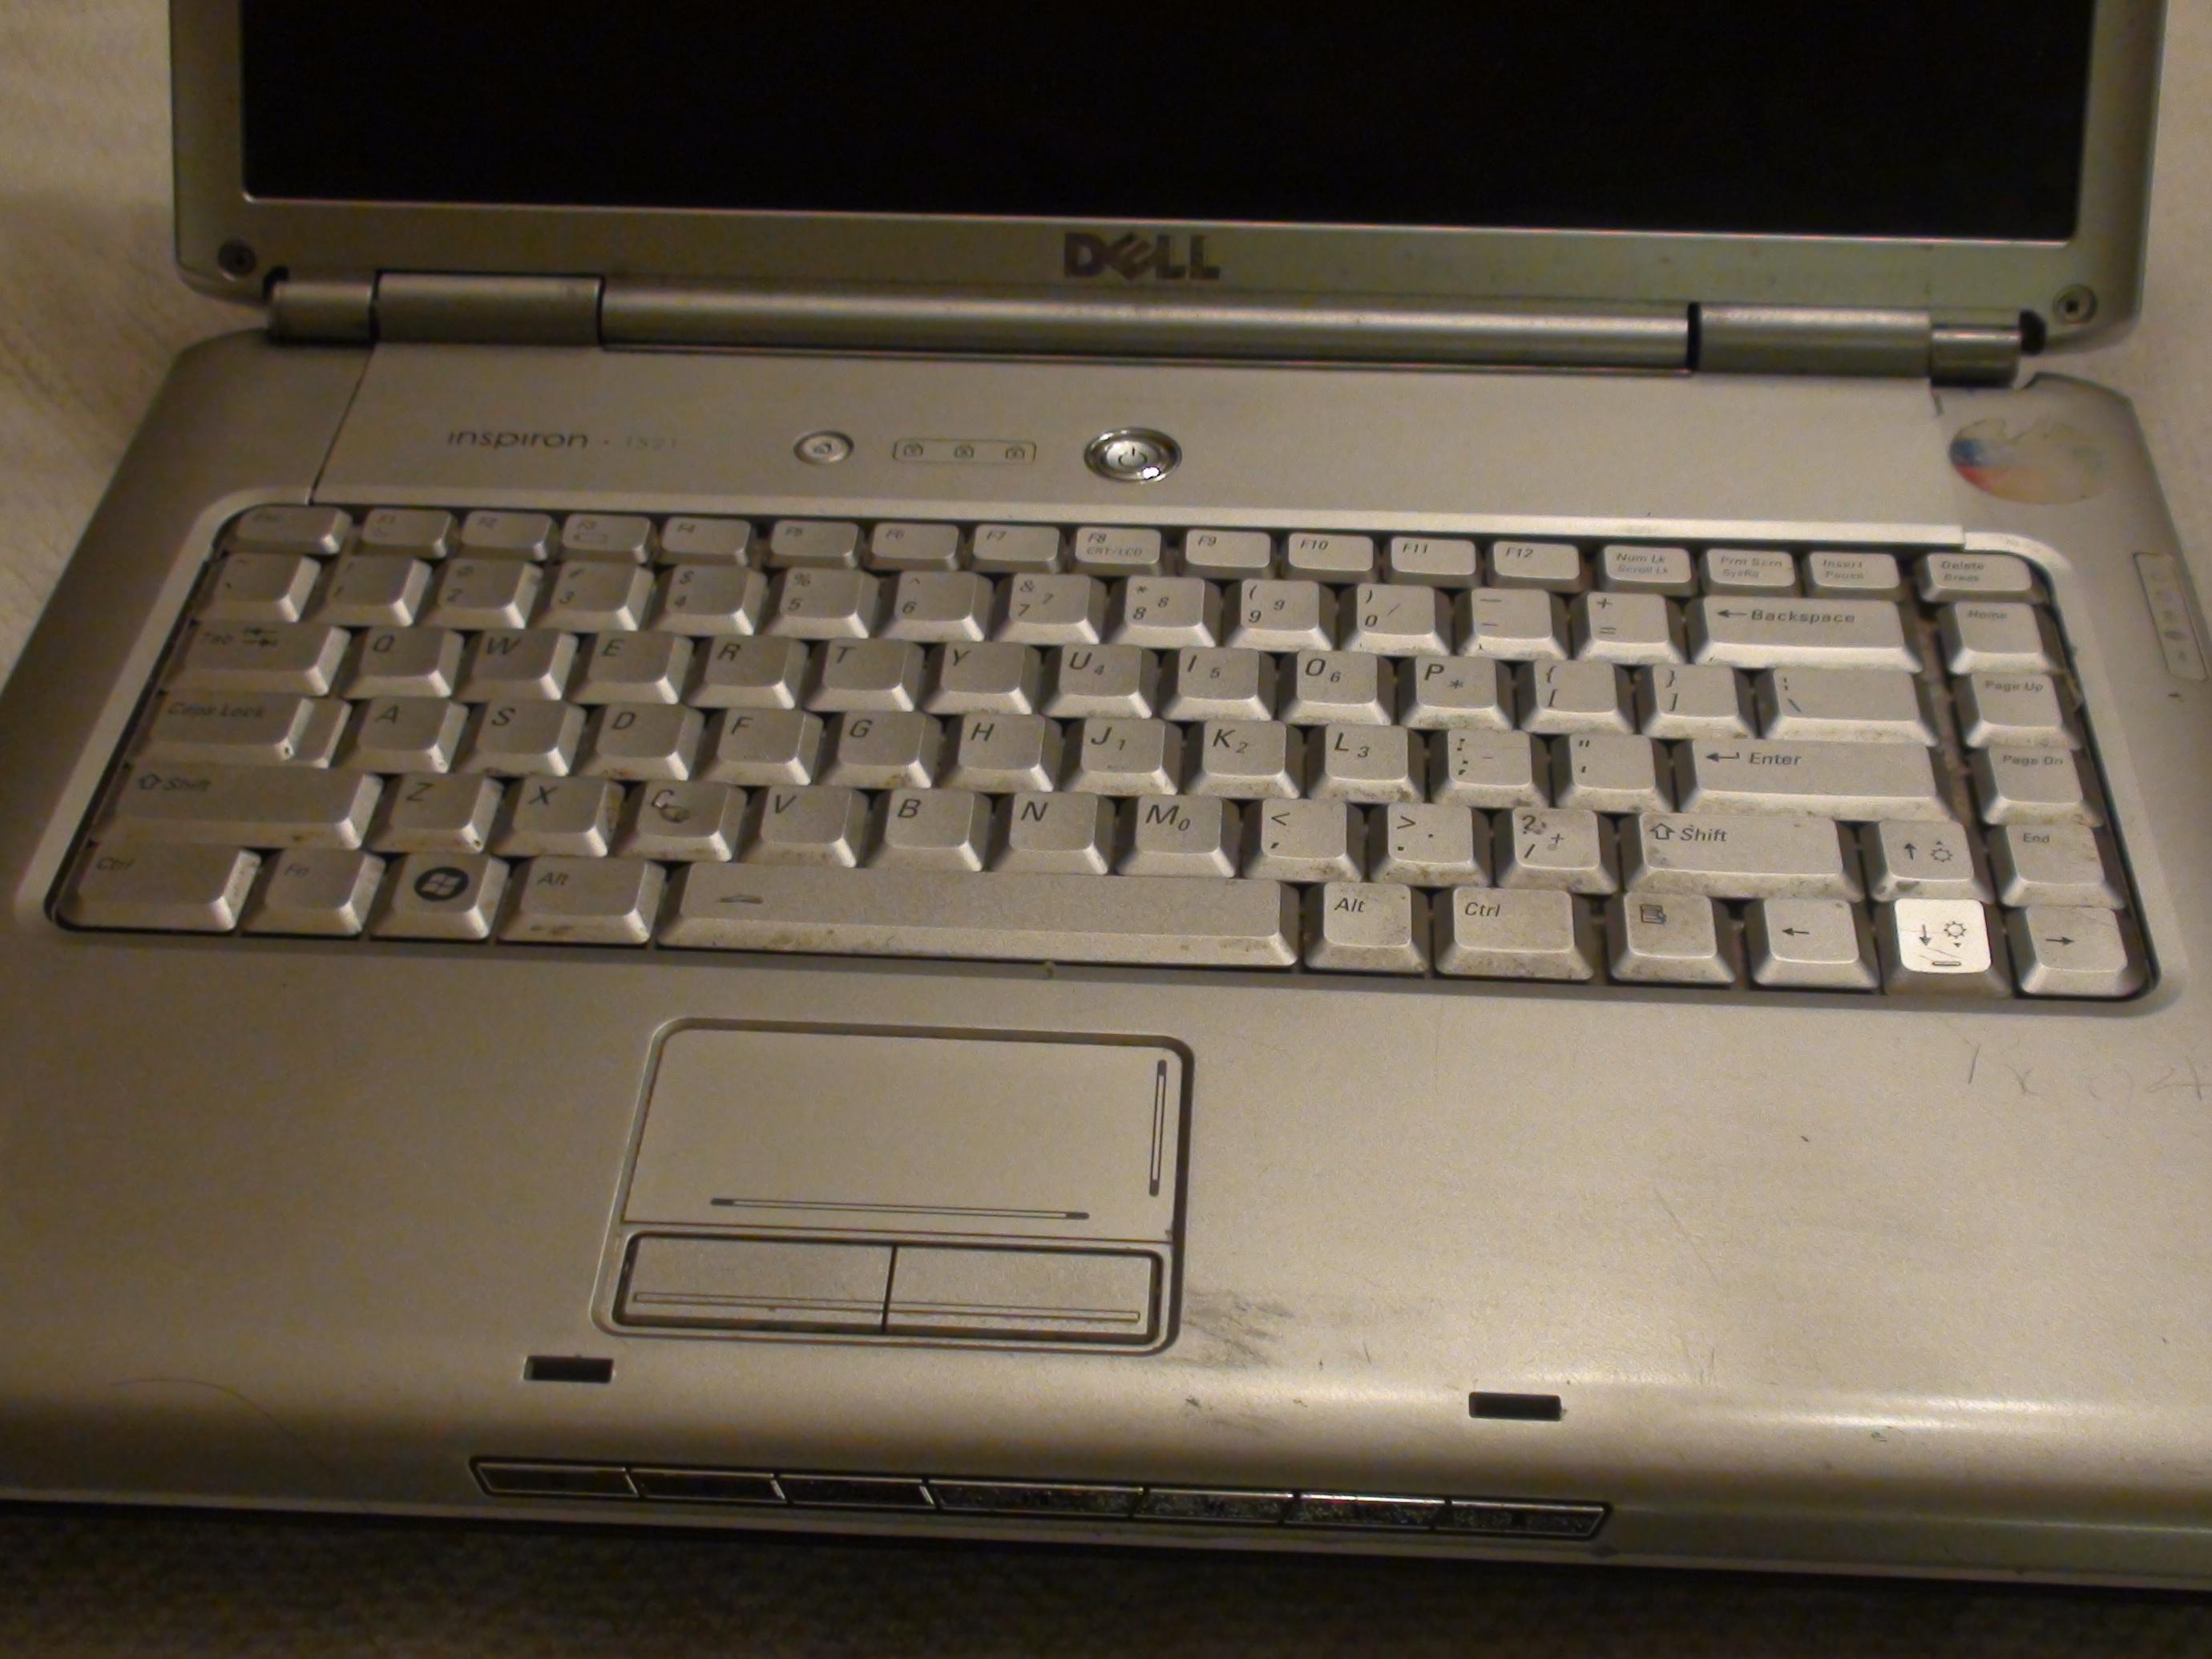 dell inspiron 1521 repair ifixit rh ifixit com Dell Inspiron ManualDownload dell inspiron 1521 user manual